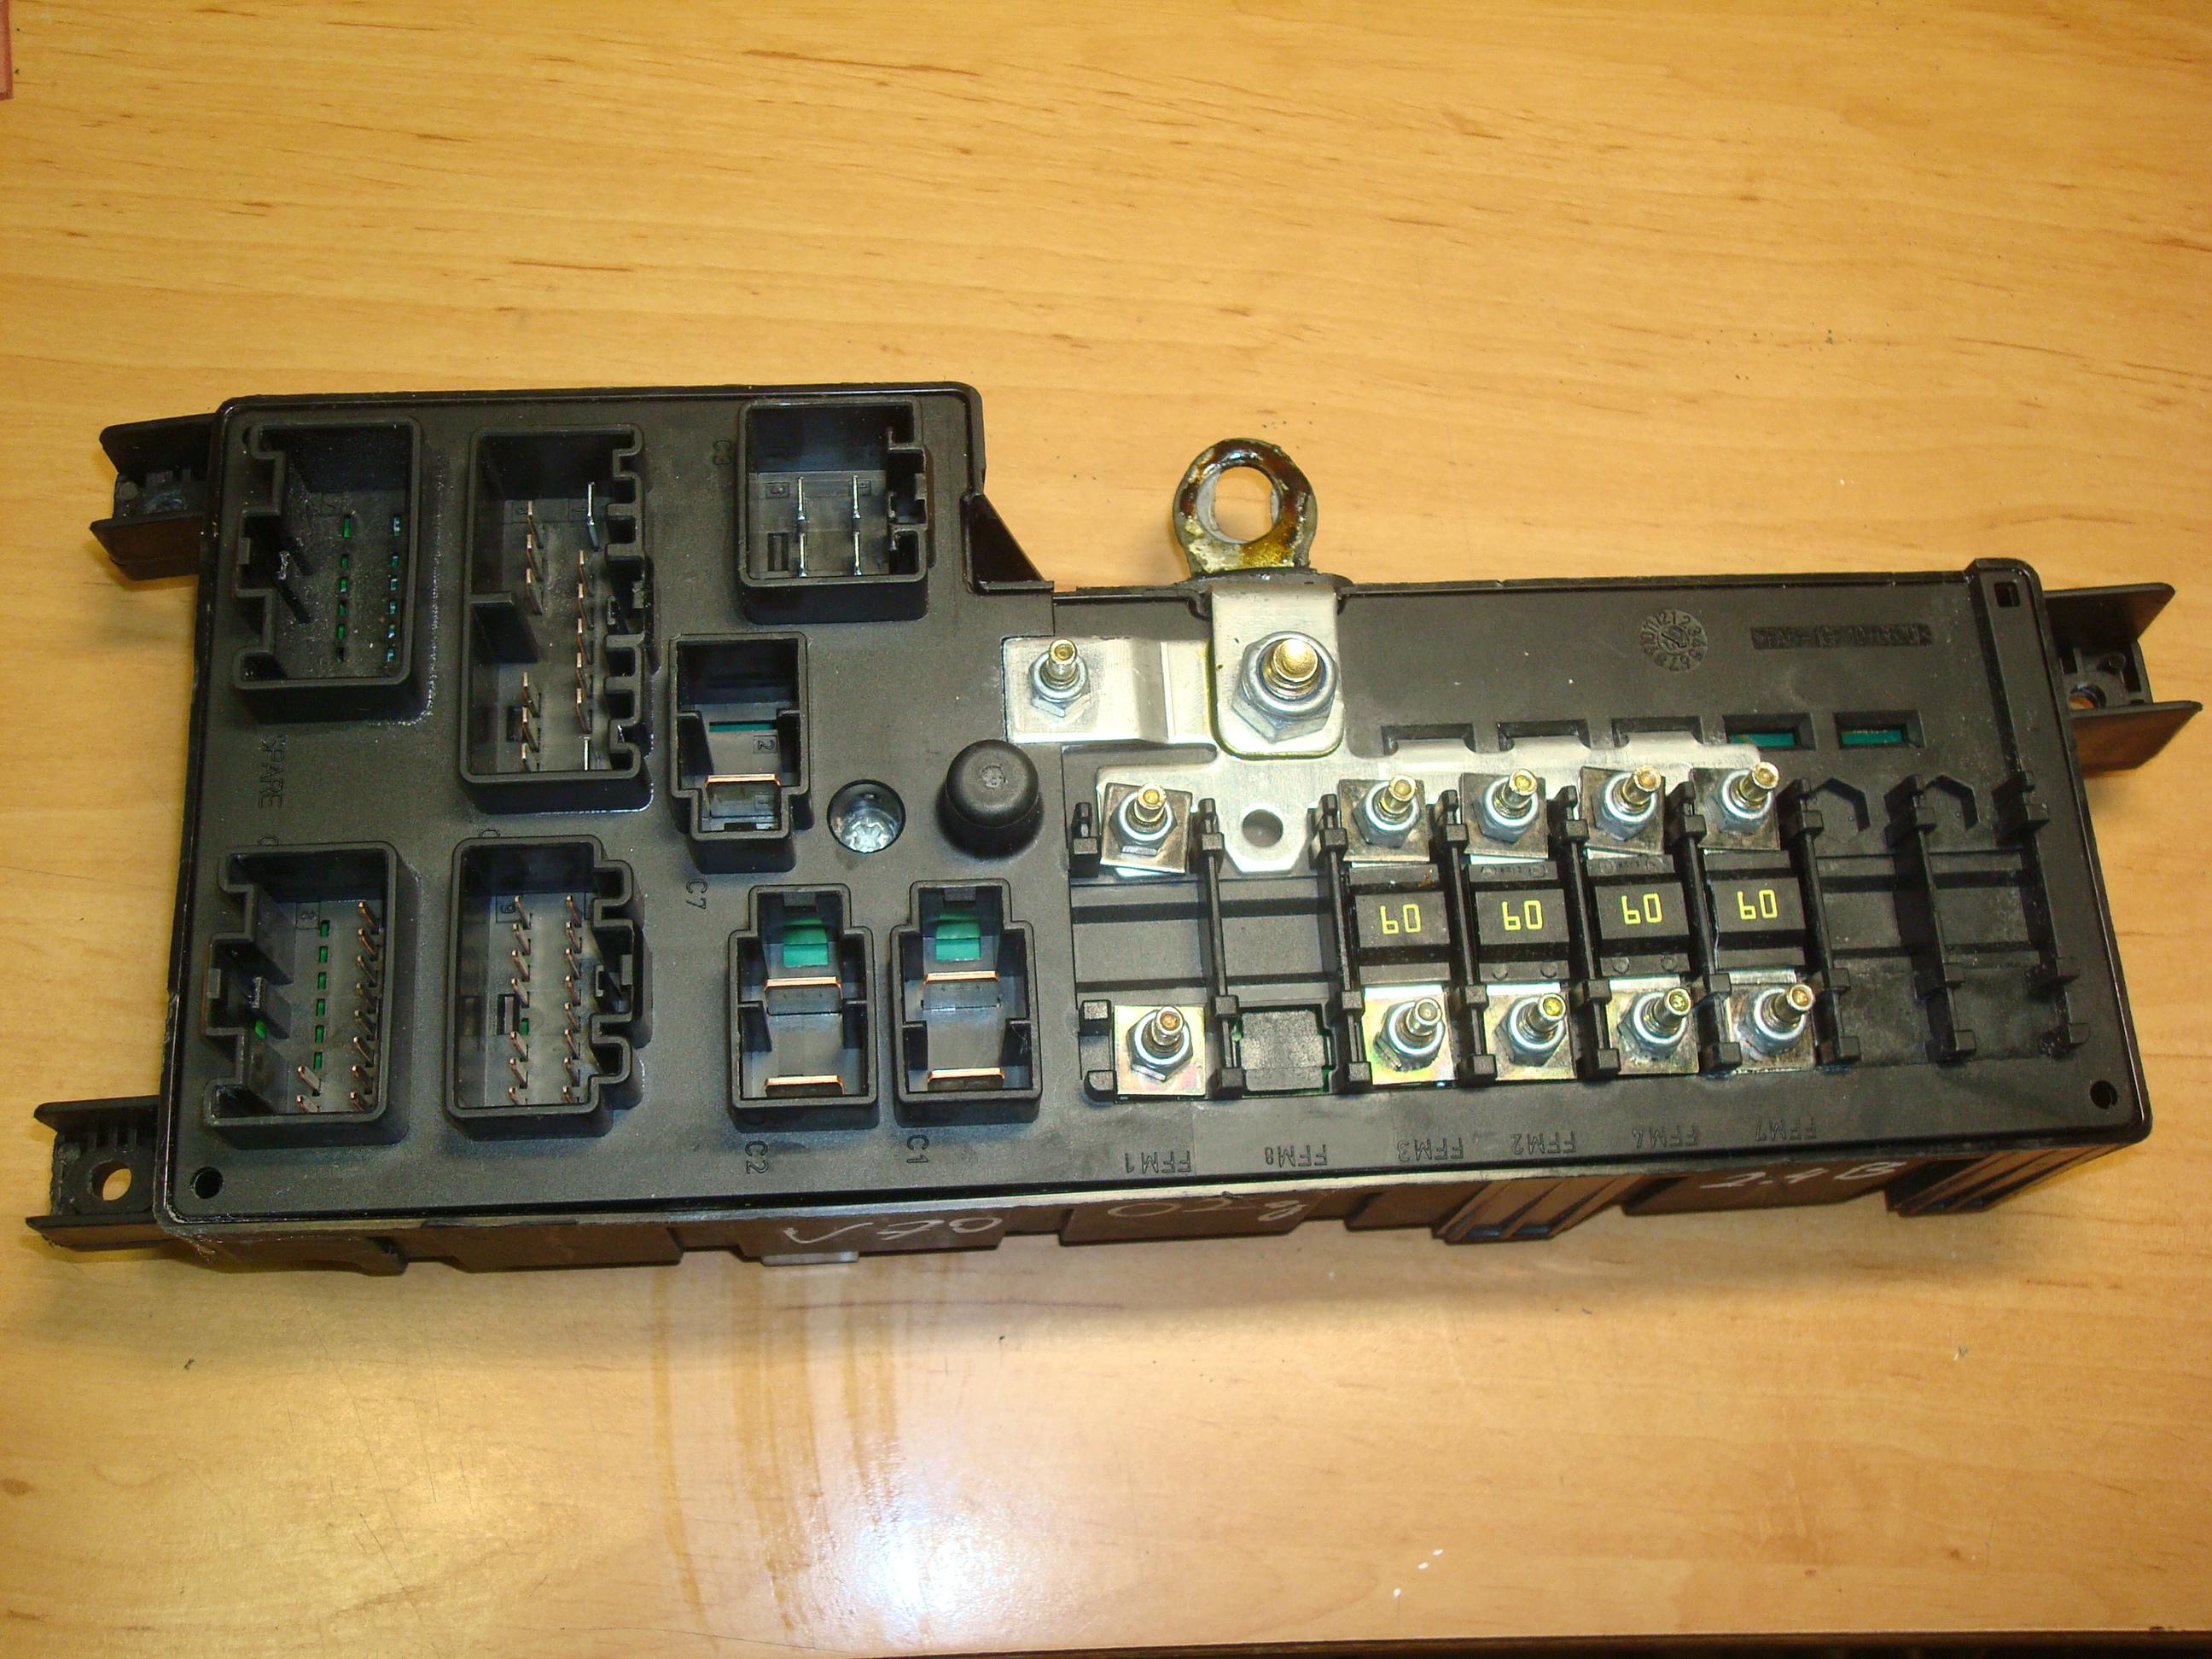 fuse box volvo v 70 volvo v70  s60  00 06  fuse box  8637841  petrol usedecus com  volvo v70  s60  00 06  fuse box